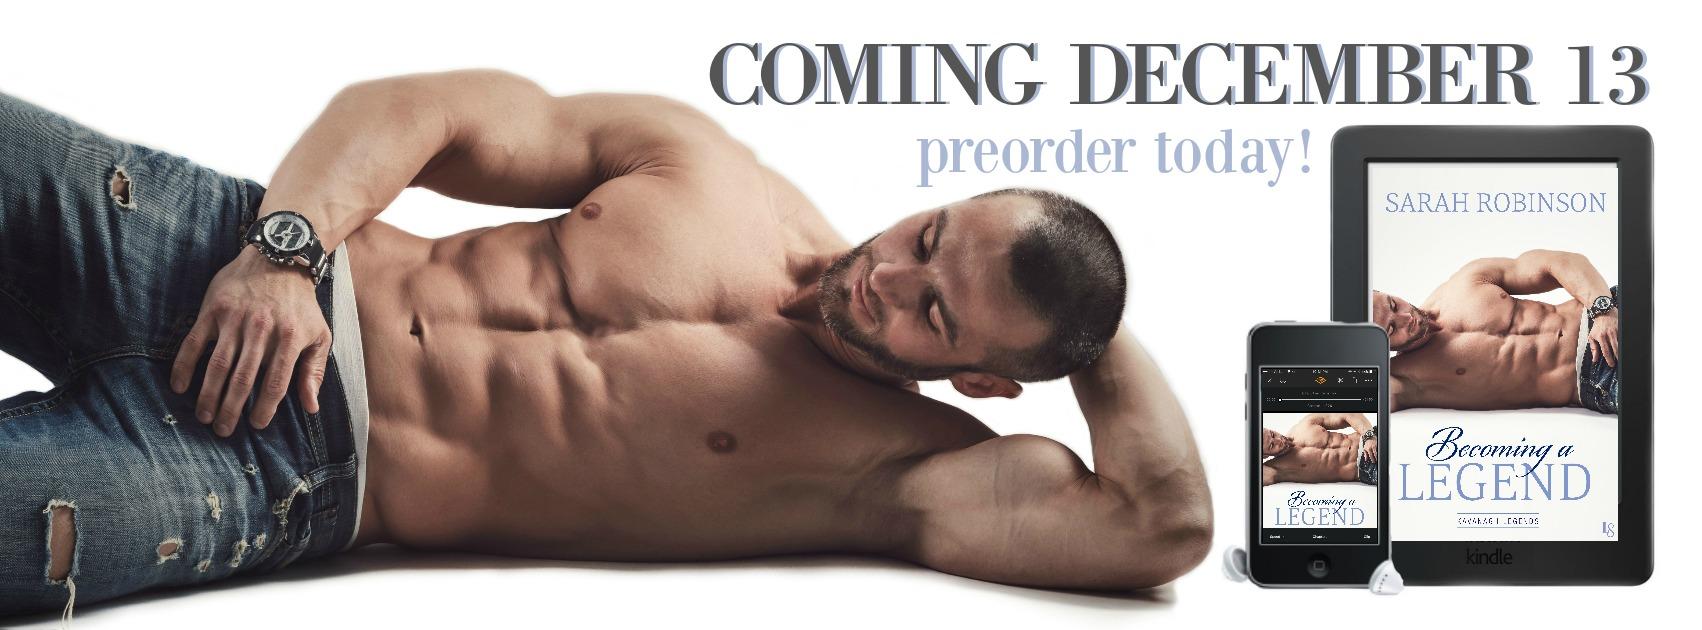 becoming-a-legend_coming-dec-13_preorder